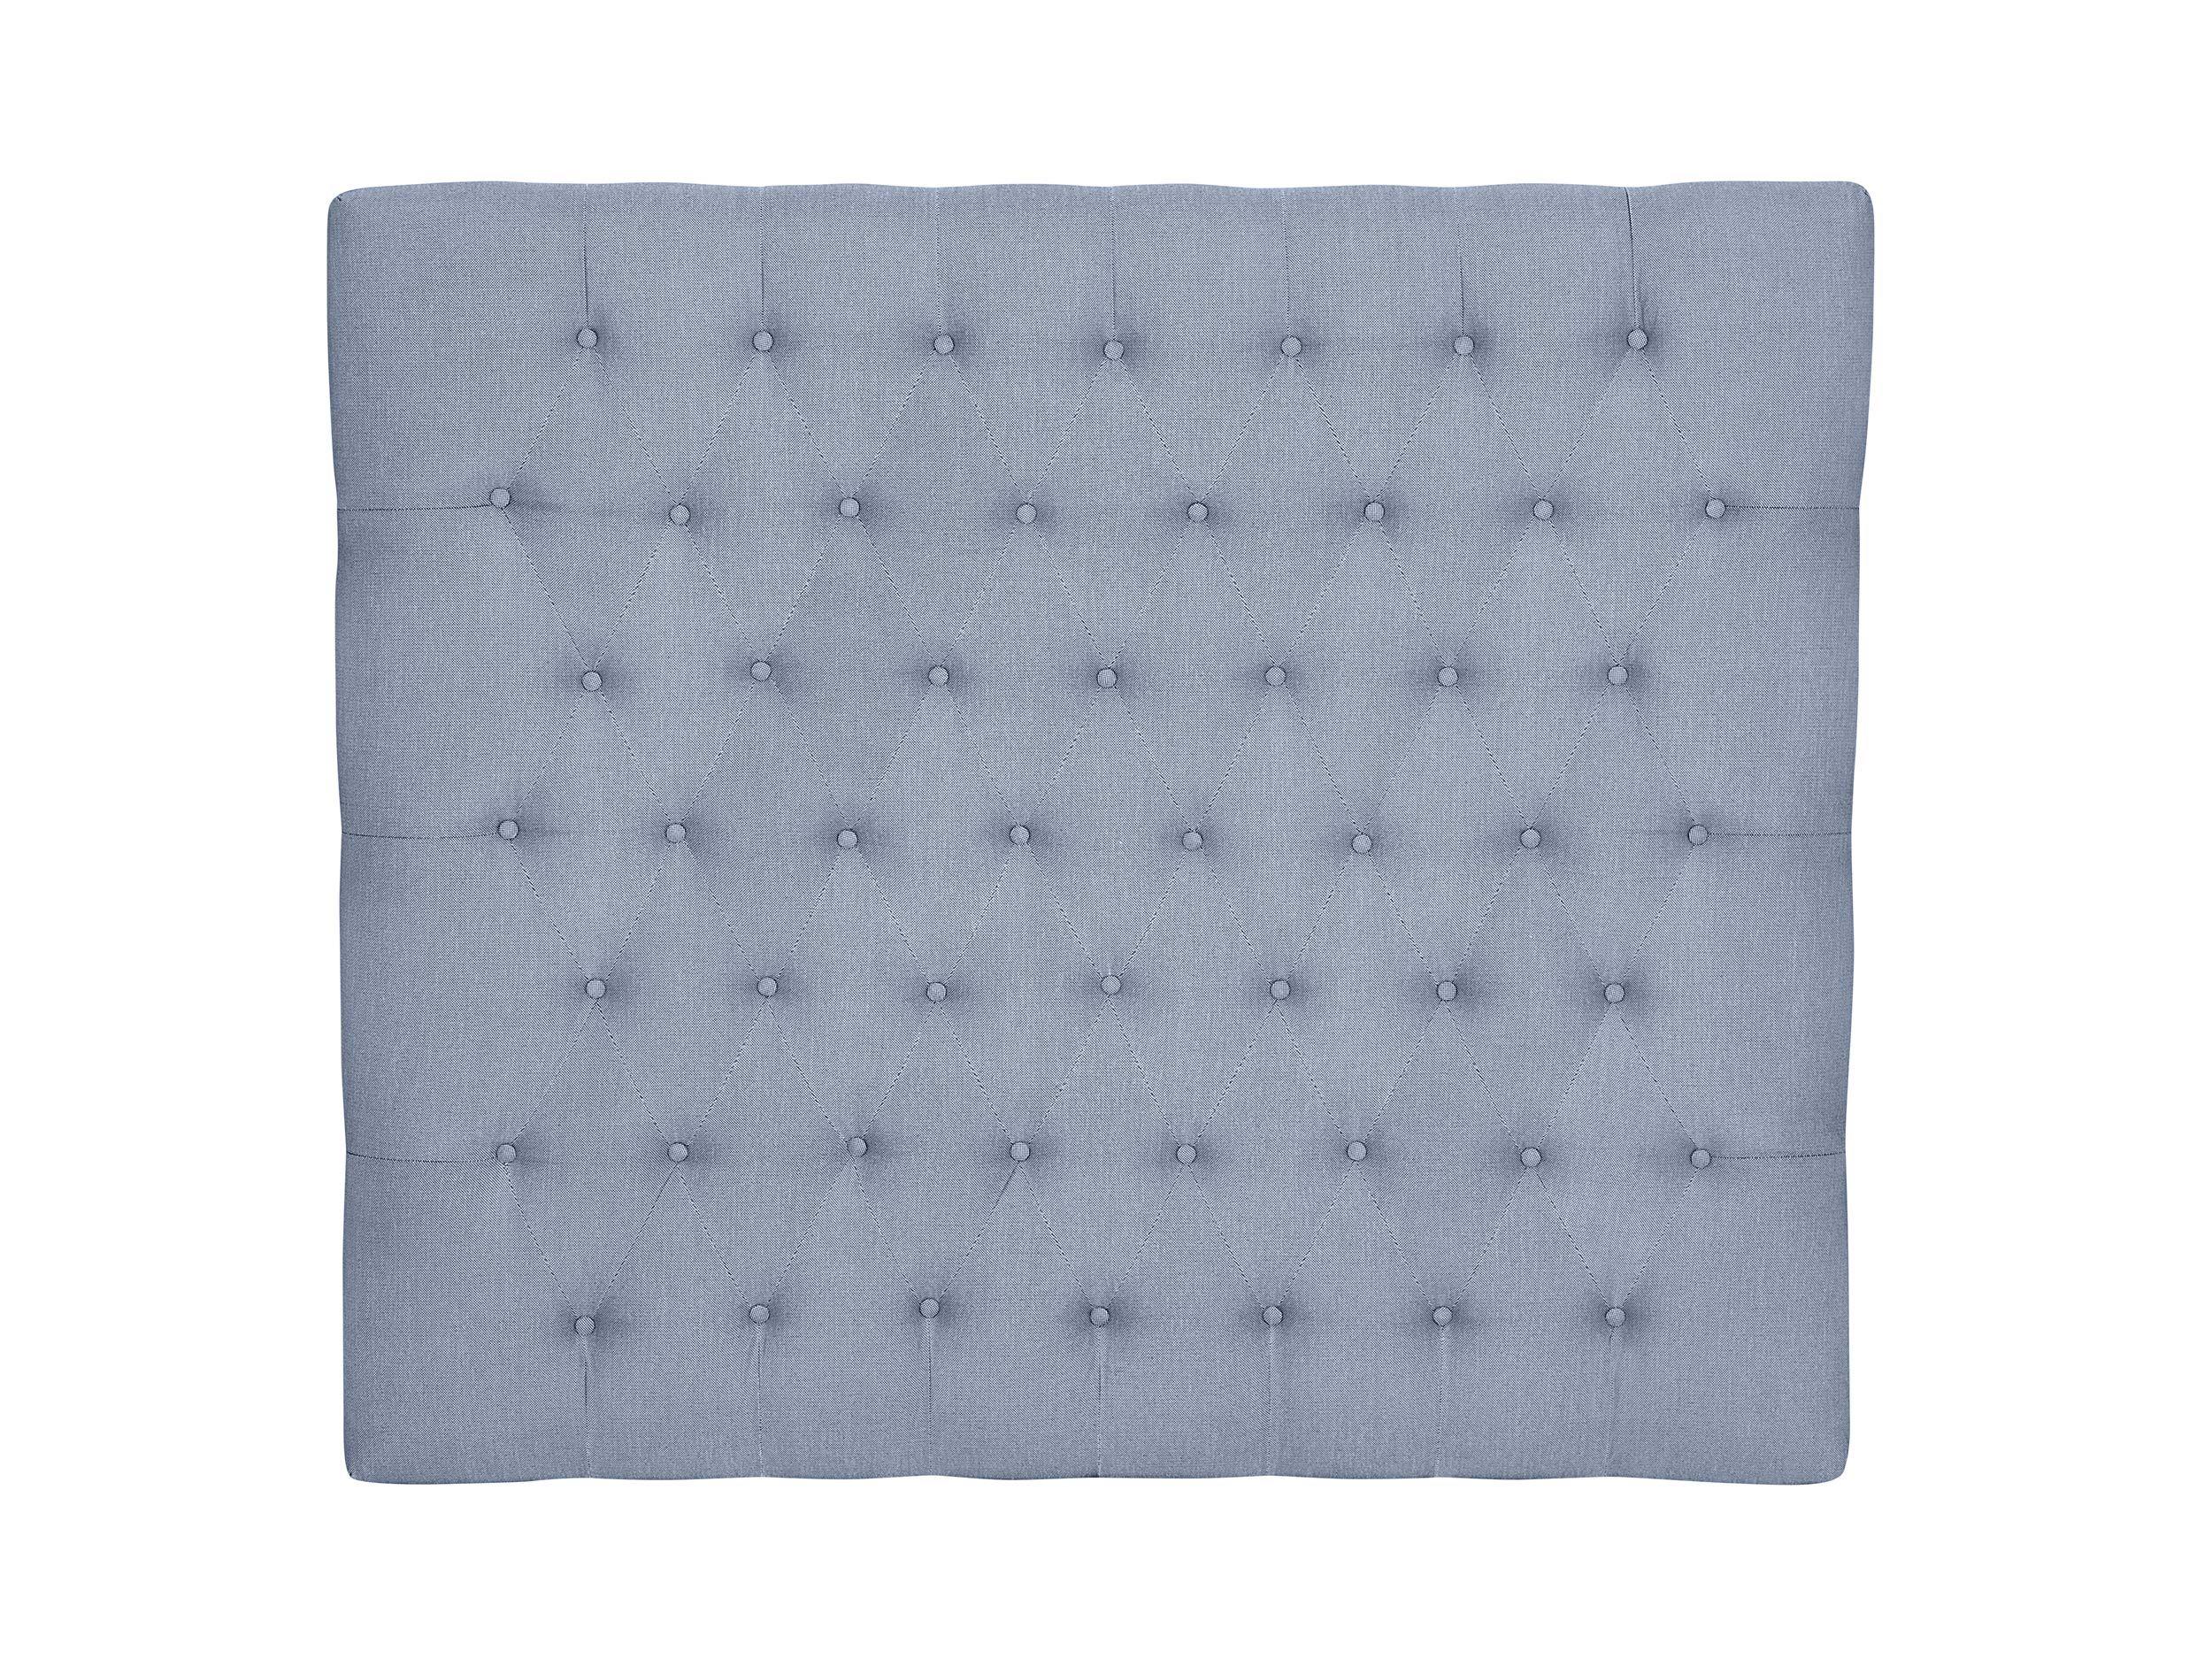 bliss kopfteil 140 blau kopfteile betten f r den innenwoh betten pinterest blaues. Black Bedroom Furniture Sets. Home Design Ideas